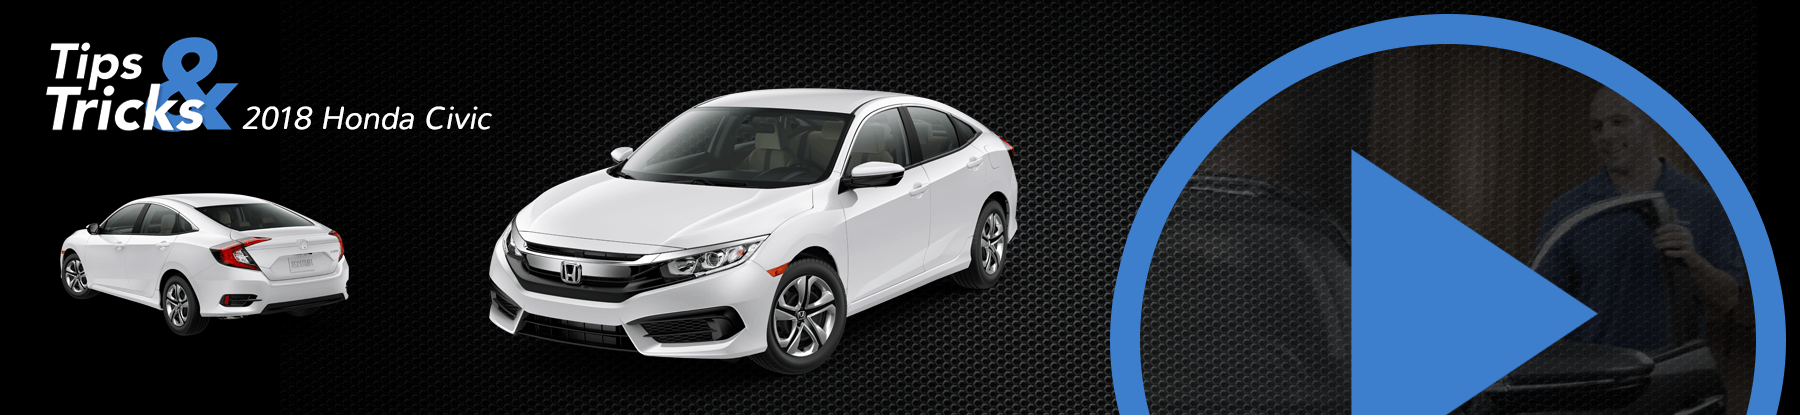 2018 Honda Civic Tips and Tricks Banner